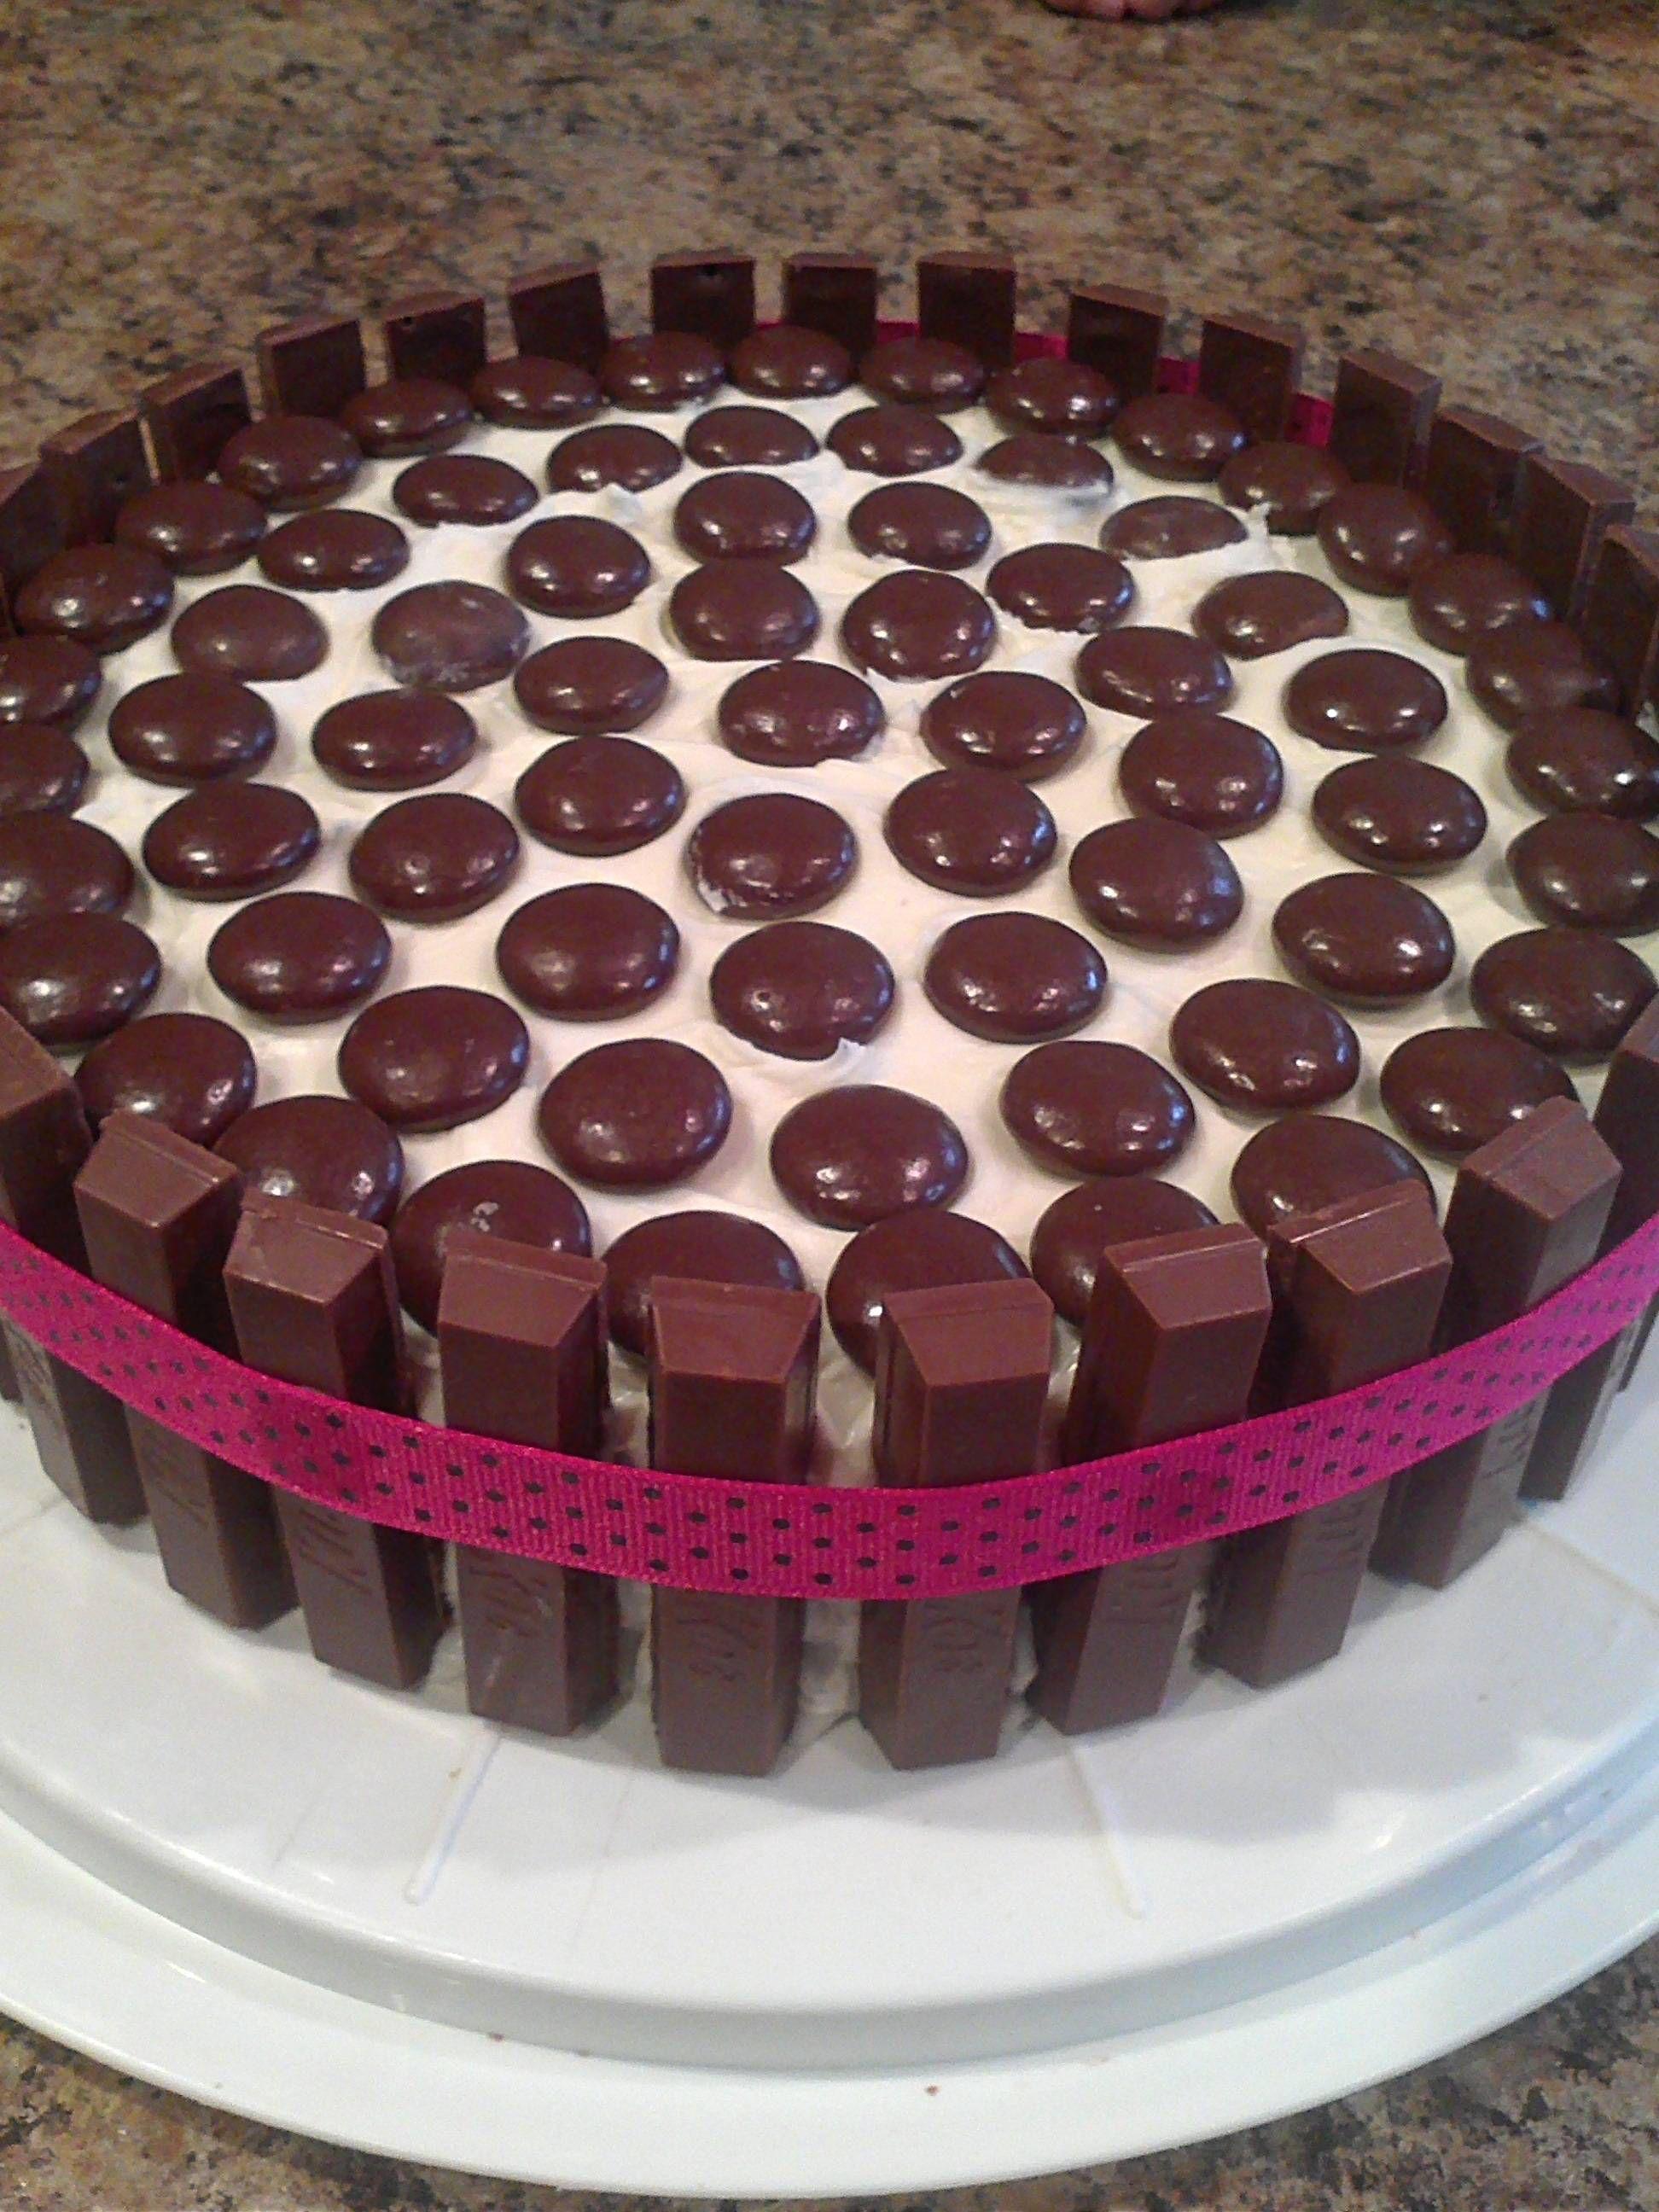 My KitKat cake(: